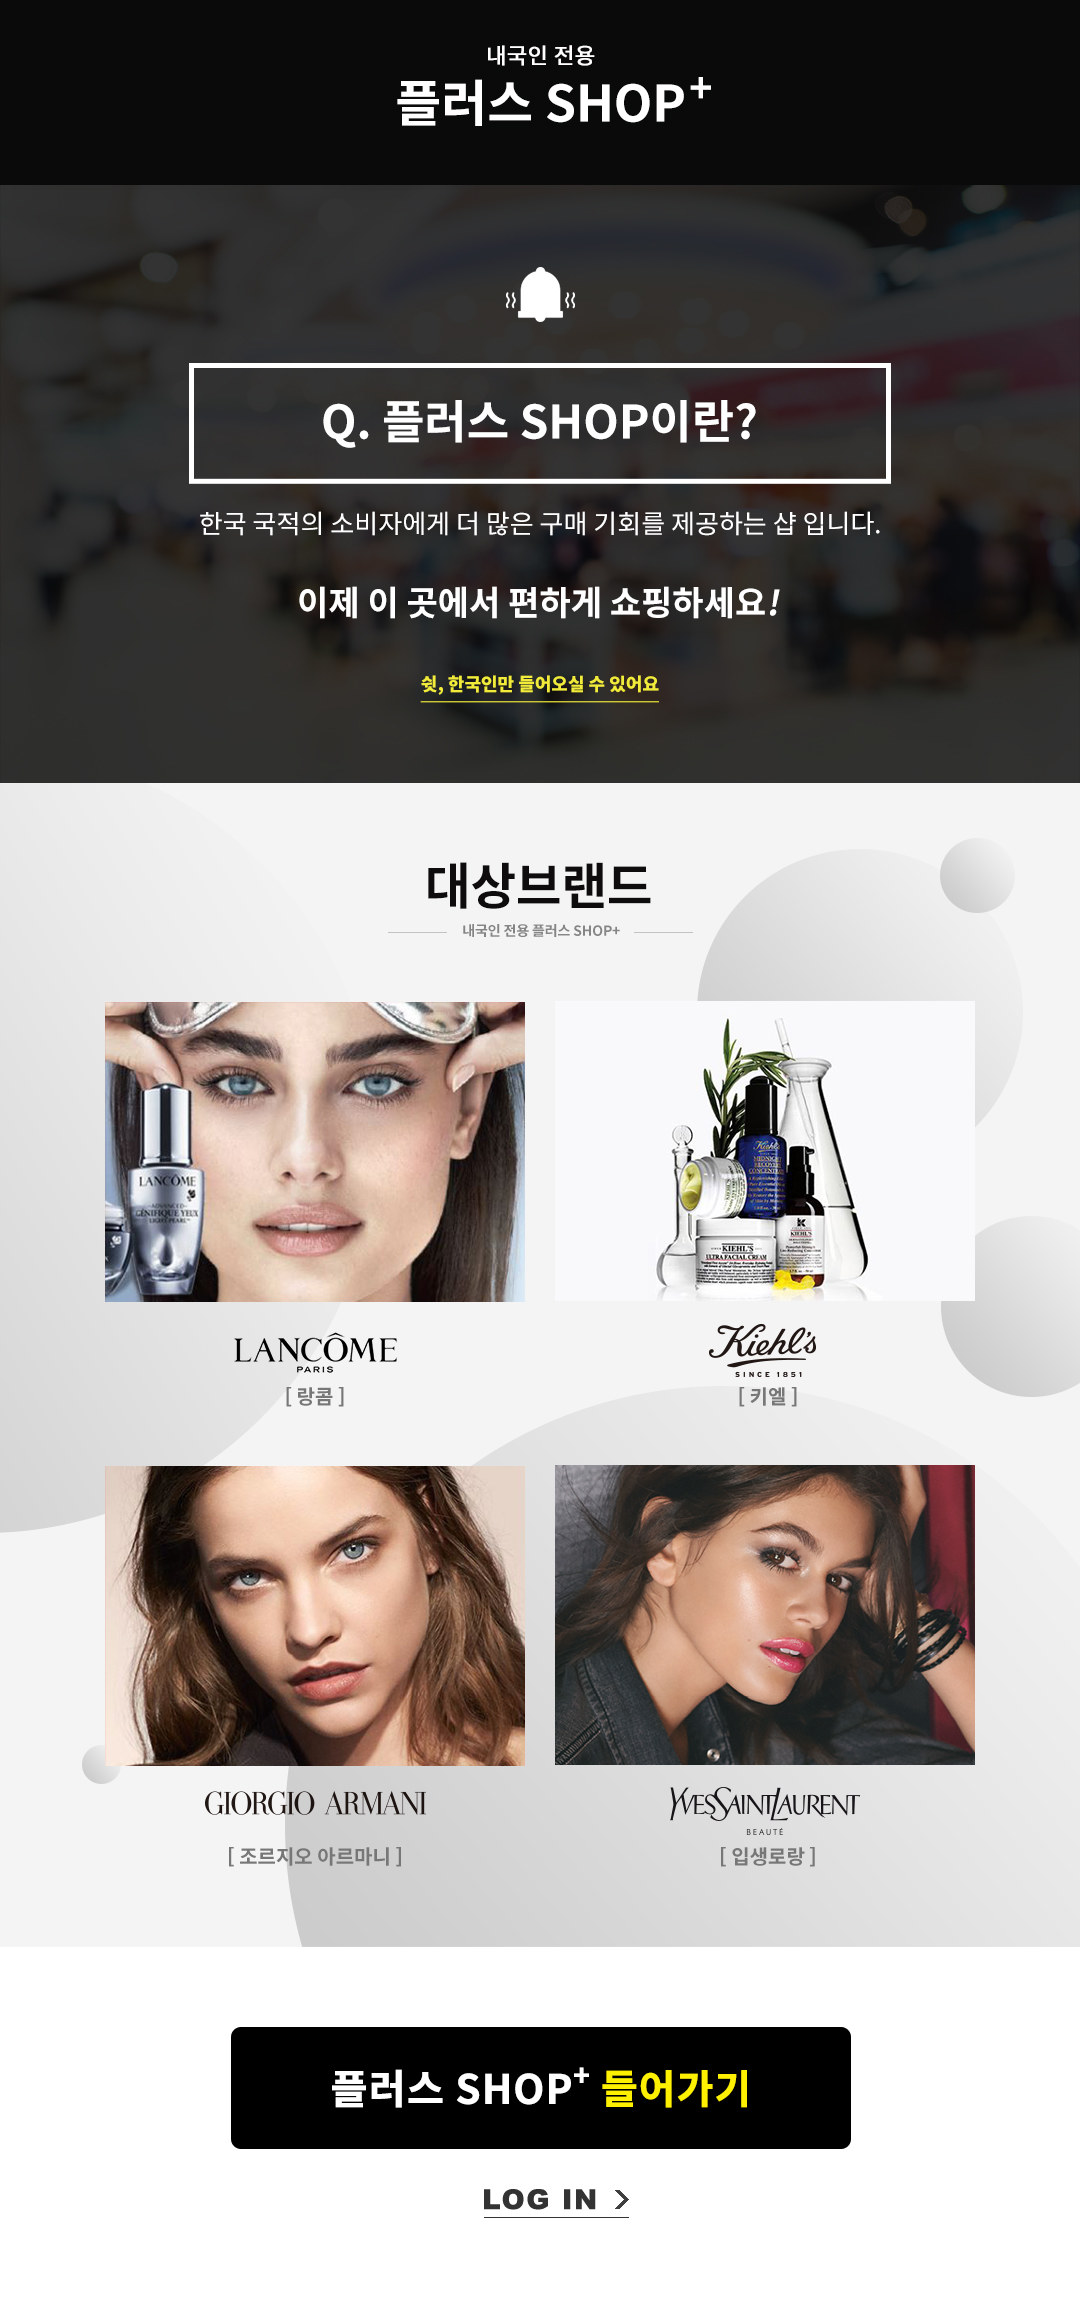 Plus Shop Only for Korea